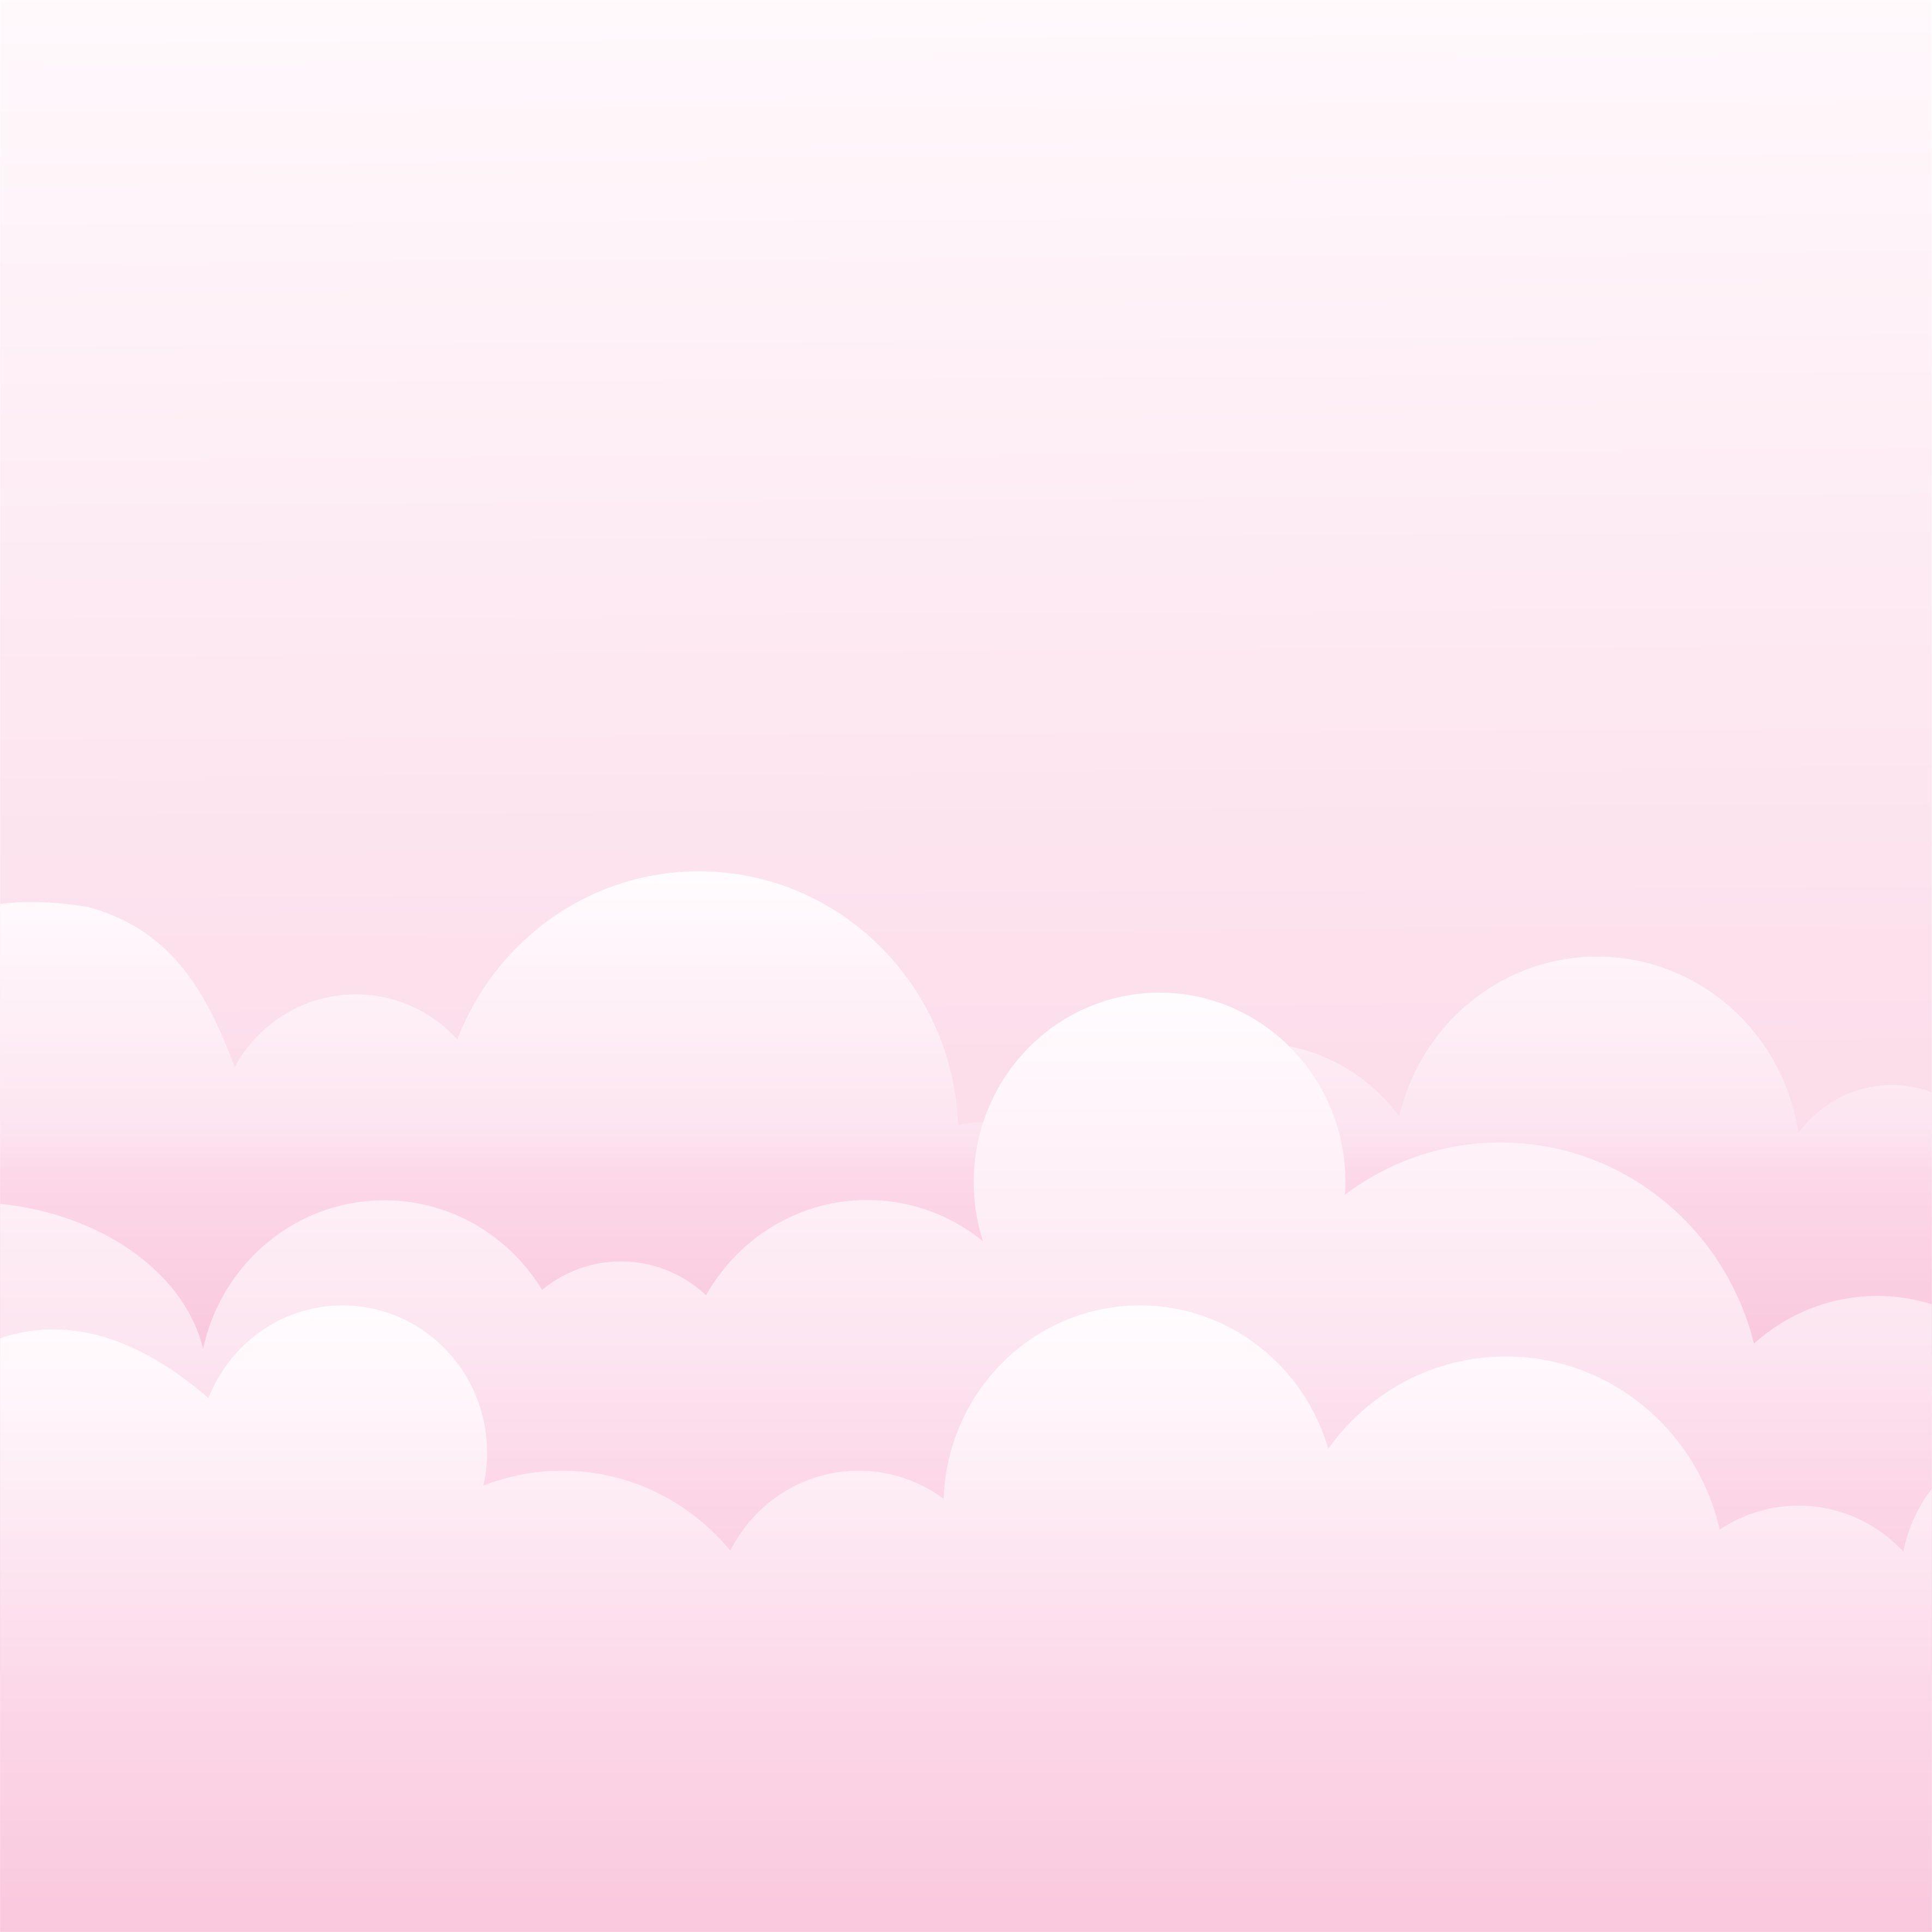 papel digital bailarina circo rosa 3